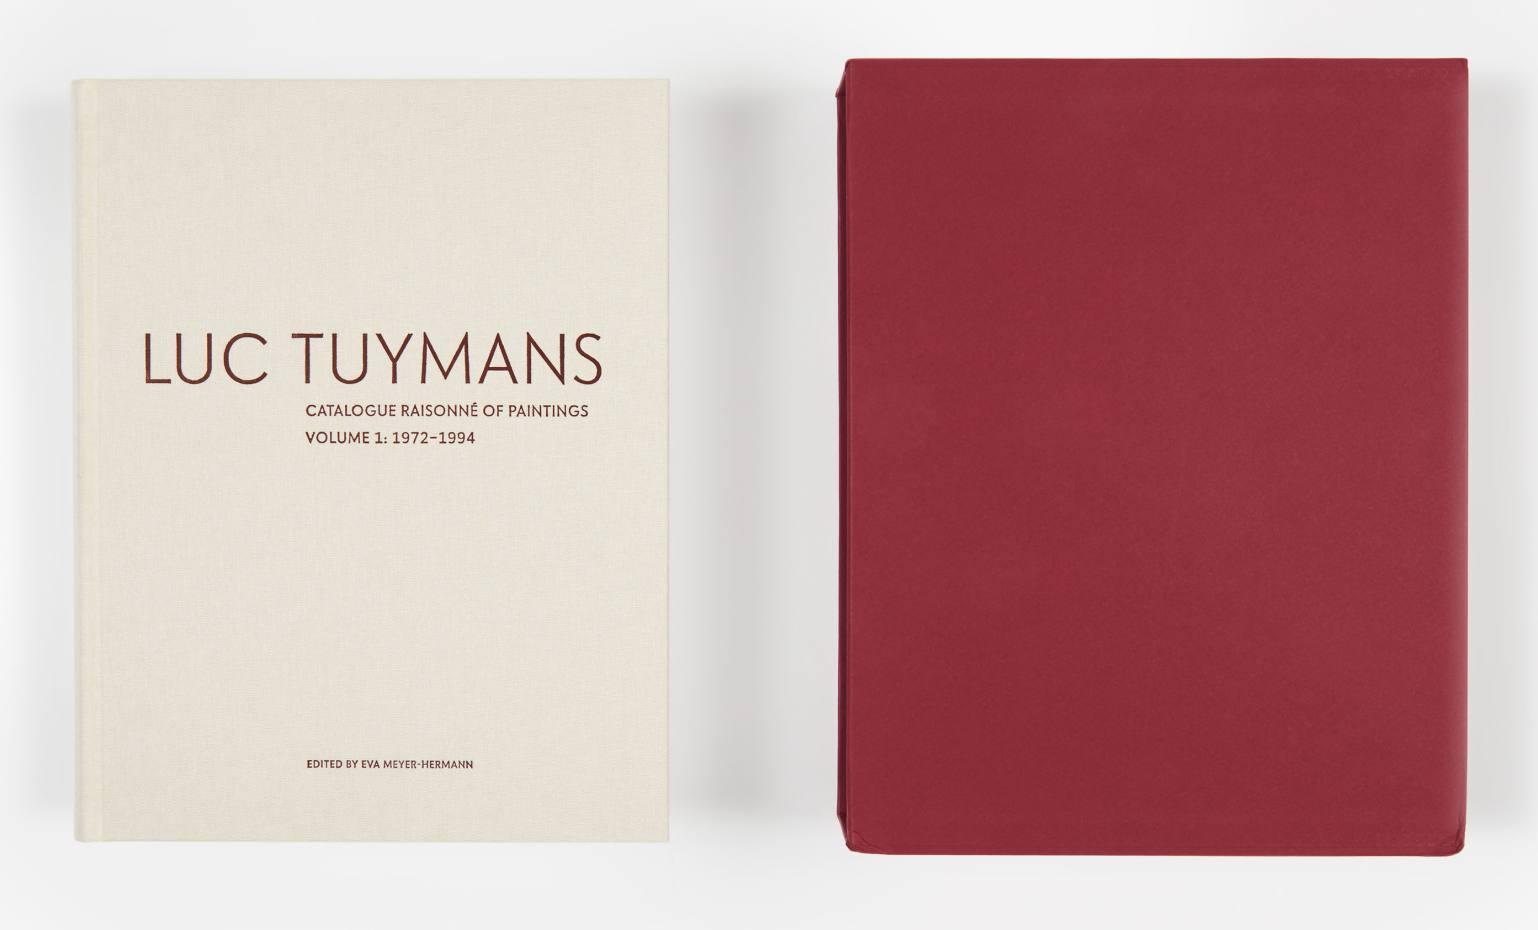 Luc Tuymans Catalogue Raisonné Volume 1, 1972-94, $200 from David Zwirner Books